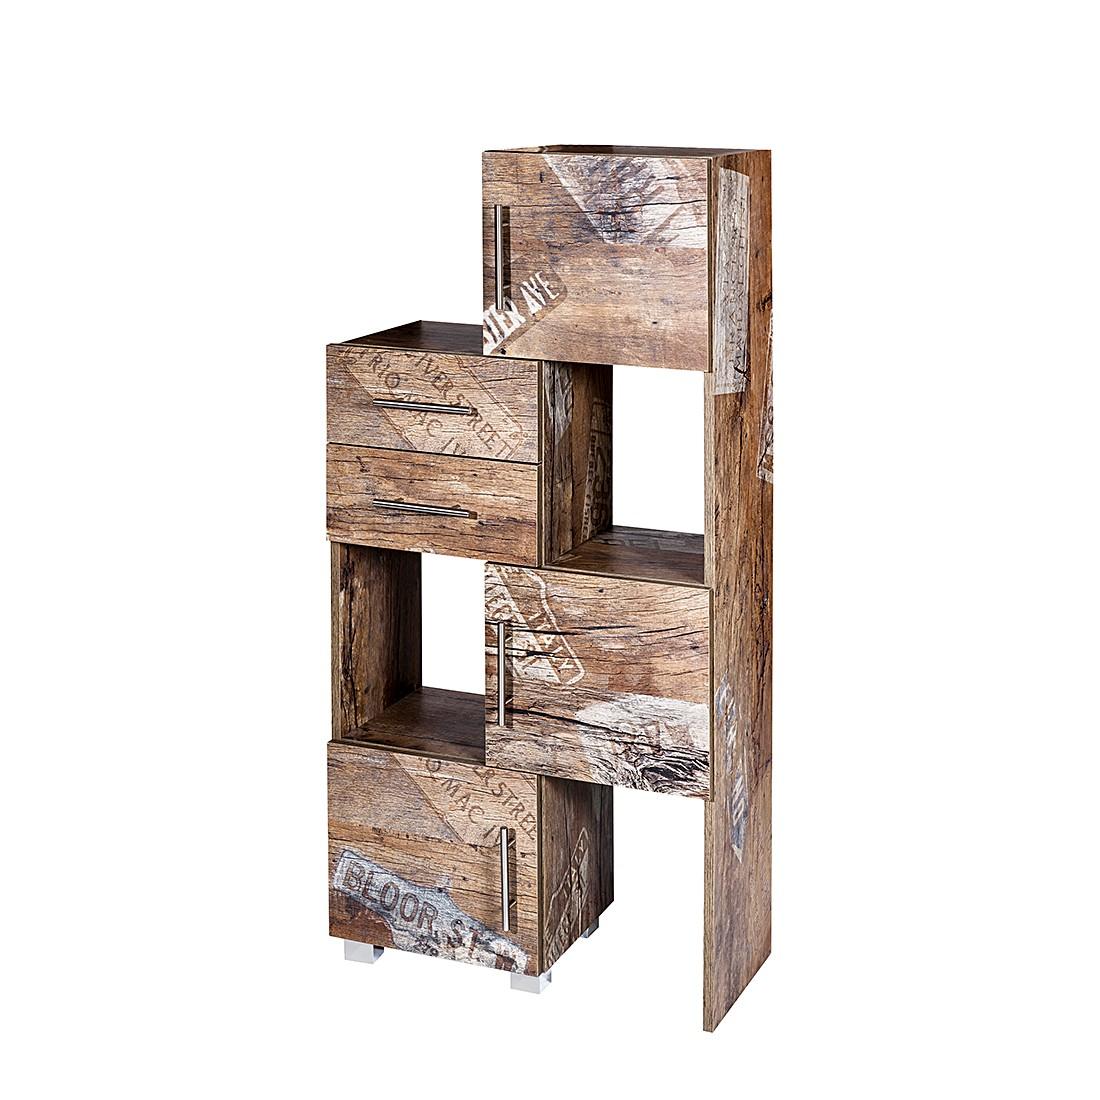 eikenhouten kast kopen online internetwinkel. Black Bedroom Furniture Sets. Home Design Ideas